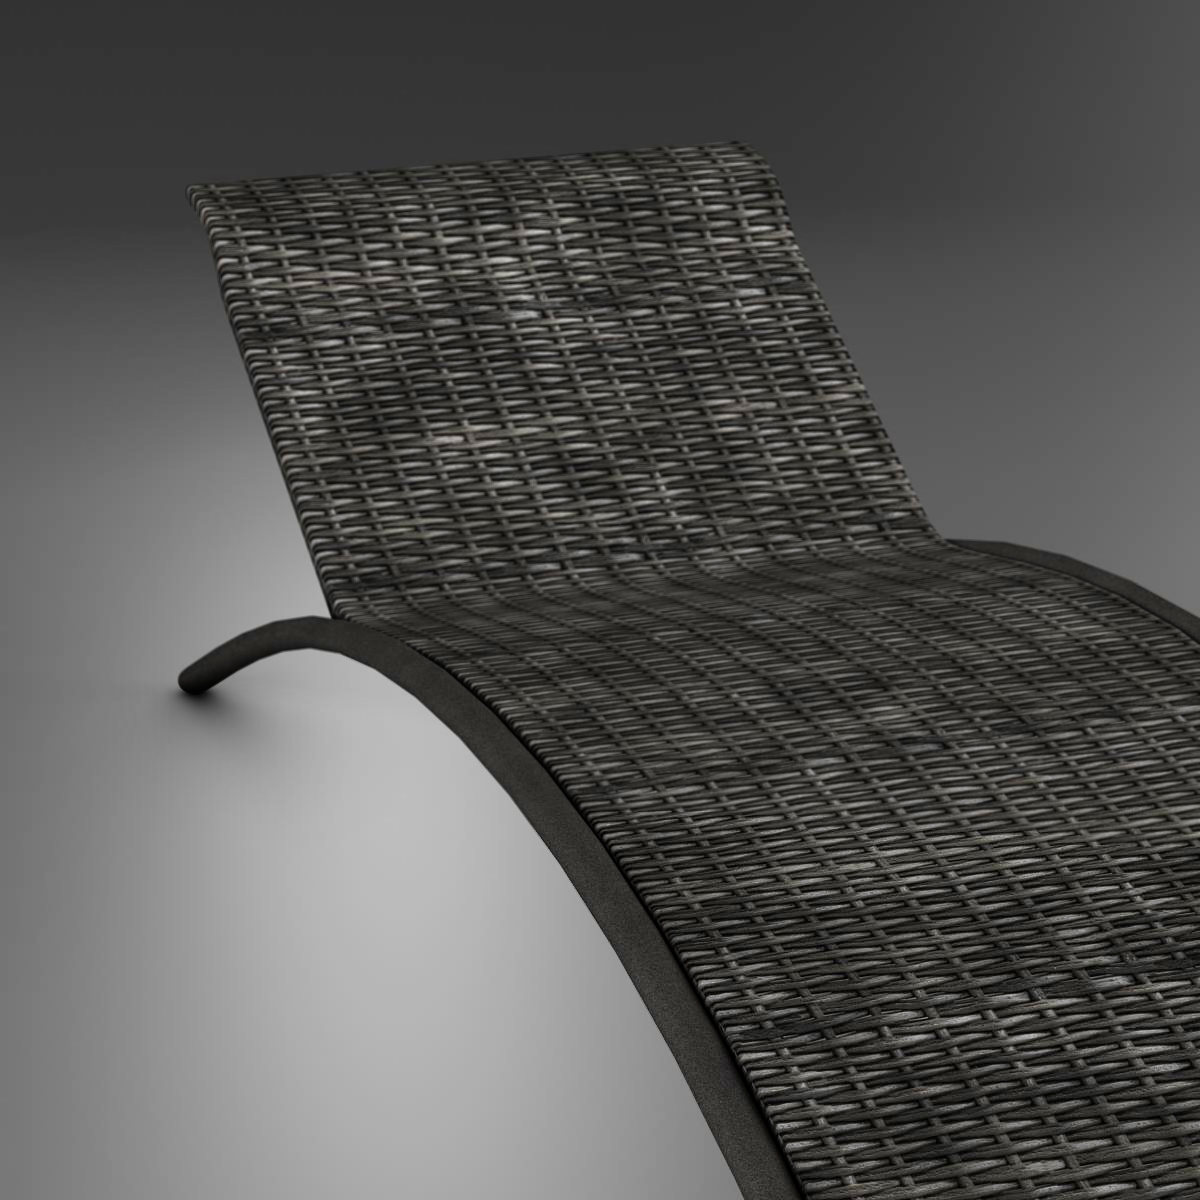 sunbed chair 3d model 3ds max fbx c4d ma mb obj 162646